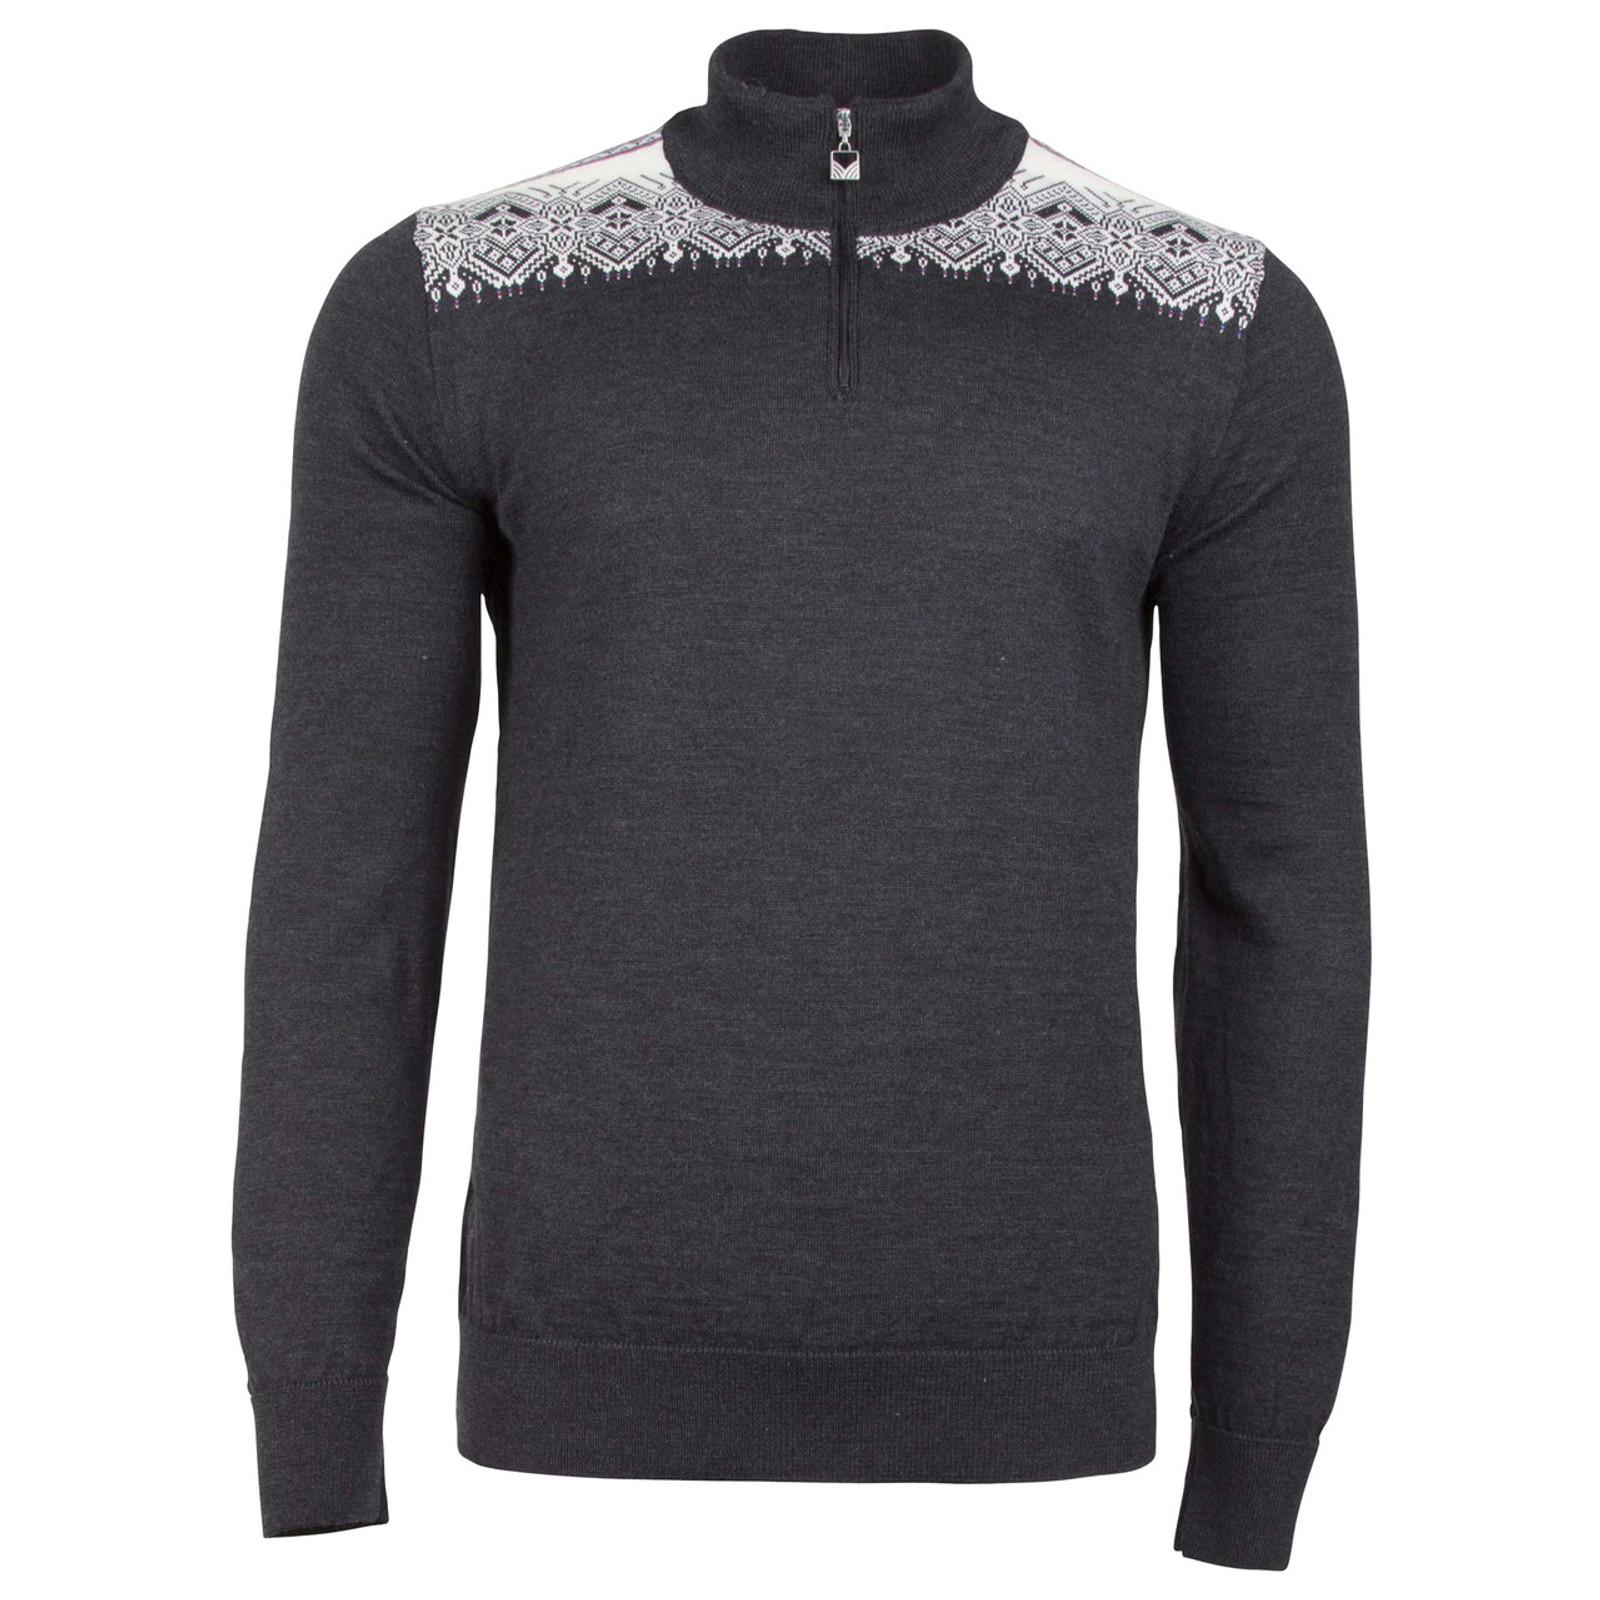 Dale of Norway Fiemme Sweater, mens, in Dark Charcoal/Grau Vig/Raspberry/Off White, 93421-T